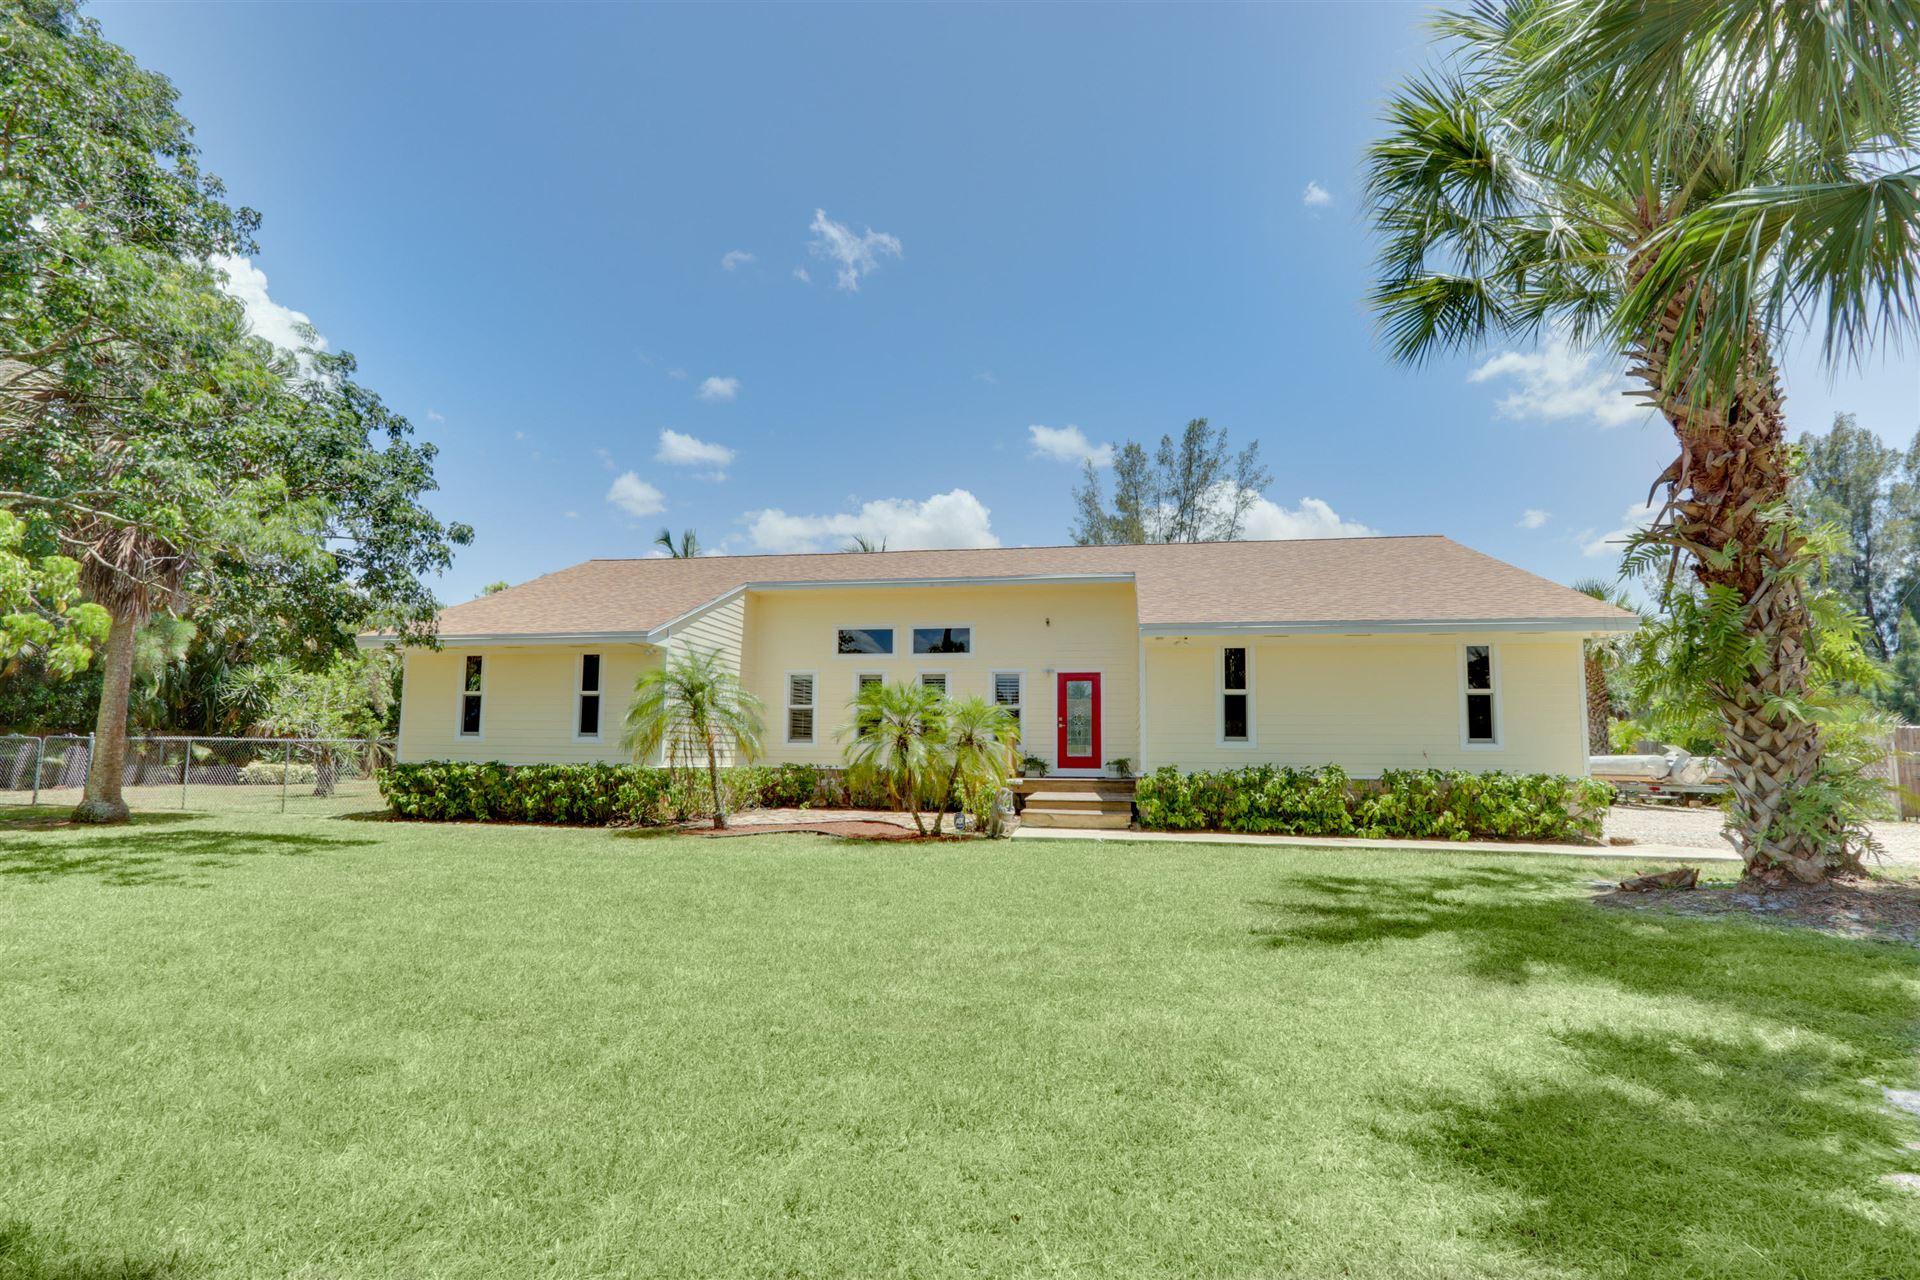 11352 Persimmon Boulevard, West Palm Beach, FL 33411 - #: RX-10636687